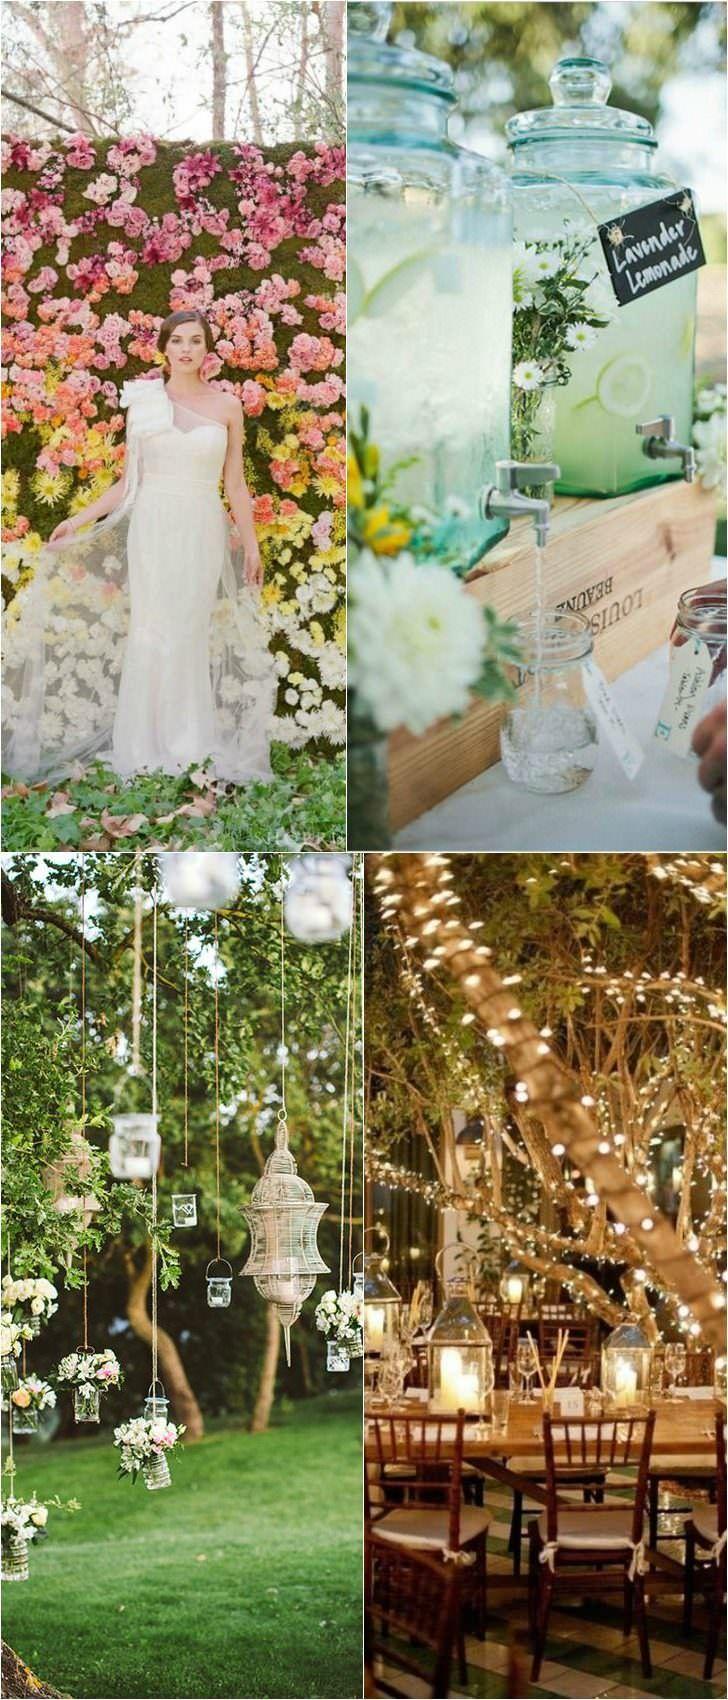 Shabby Chic Garden Ideas   Homsgarden